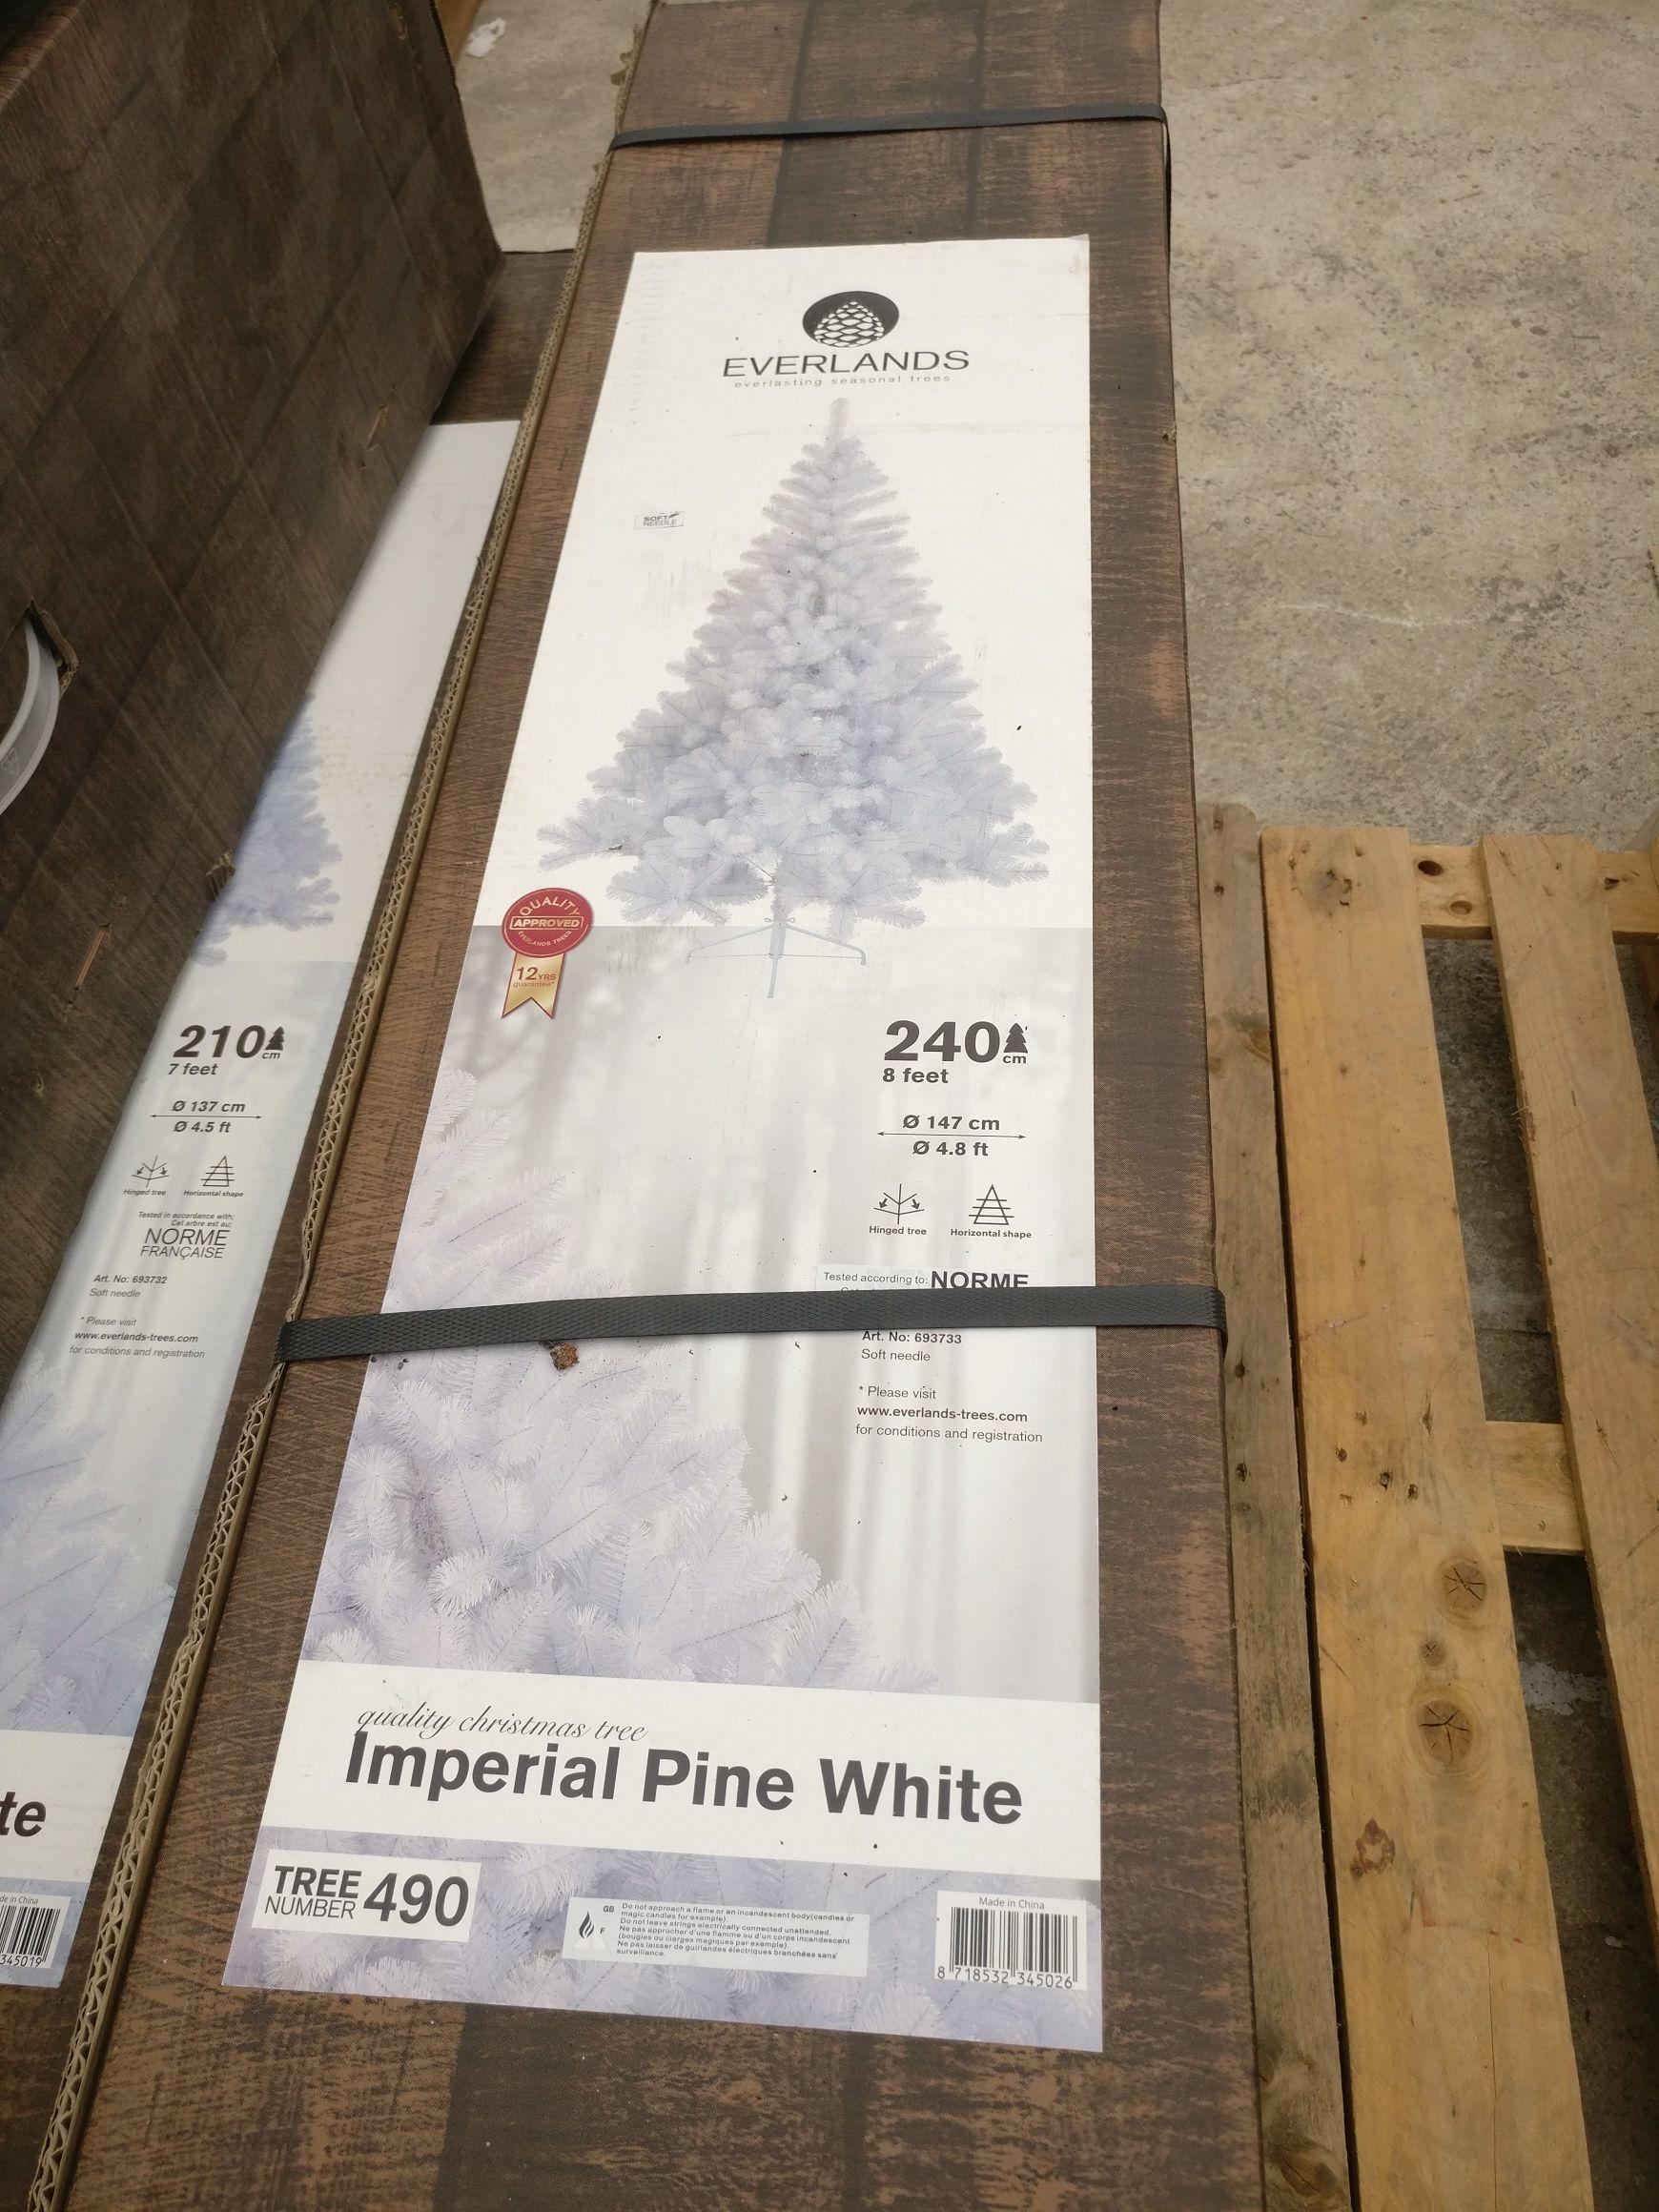 Sapin de Noël Imperial Pine White Everland - 240 cm - Vegetalis Hyères (83)